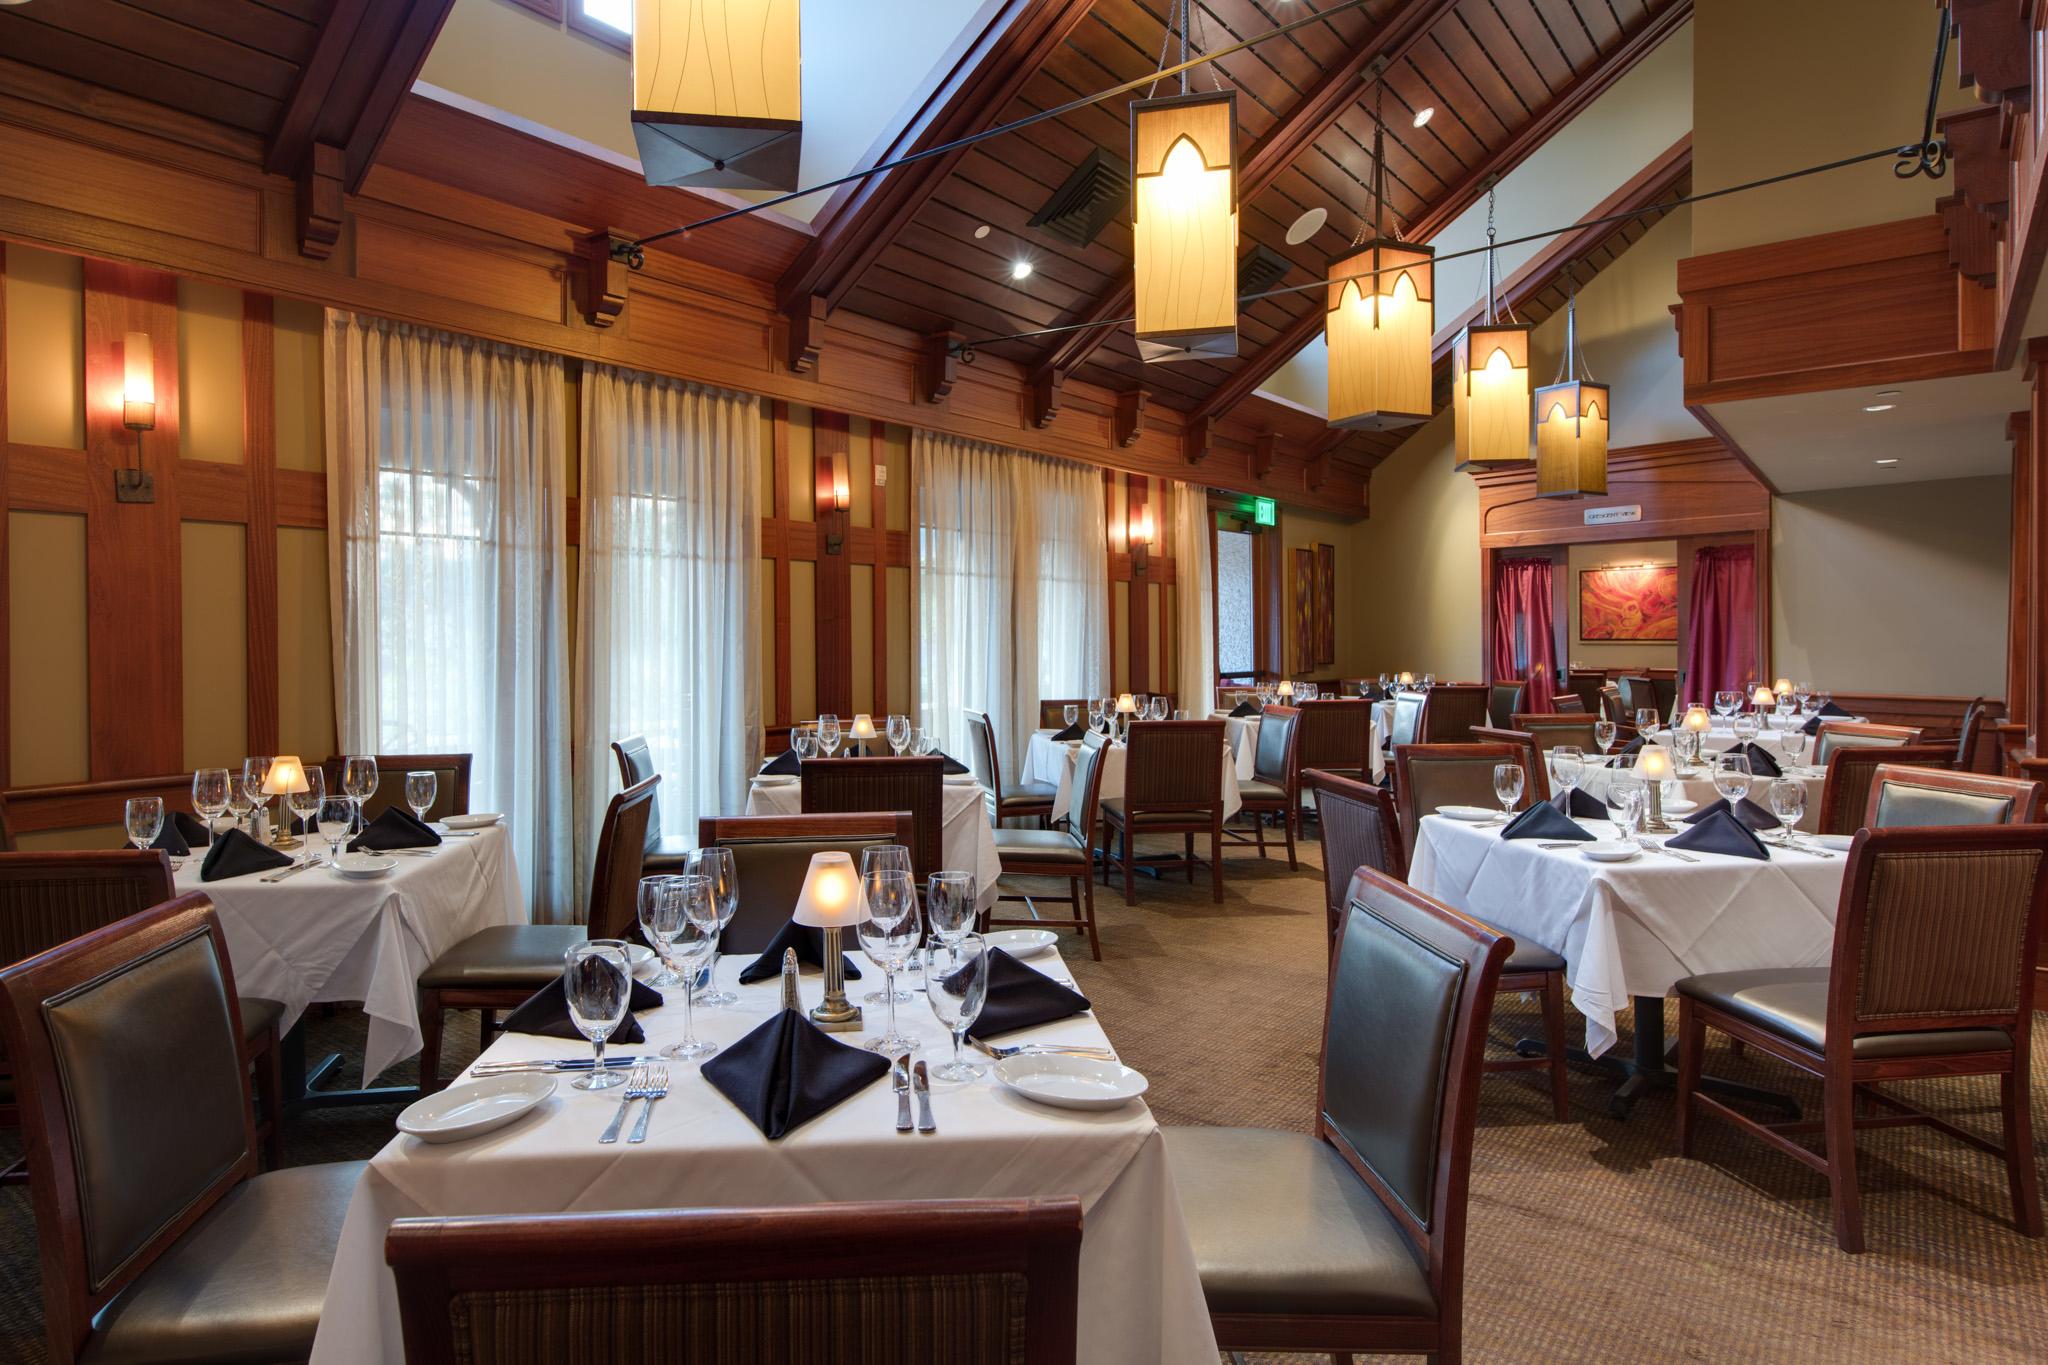 Ruth's Chris Steak House - Dining Room